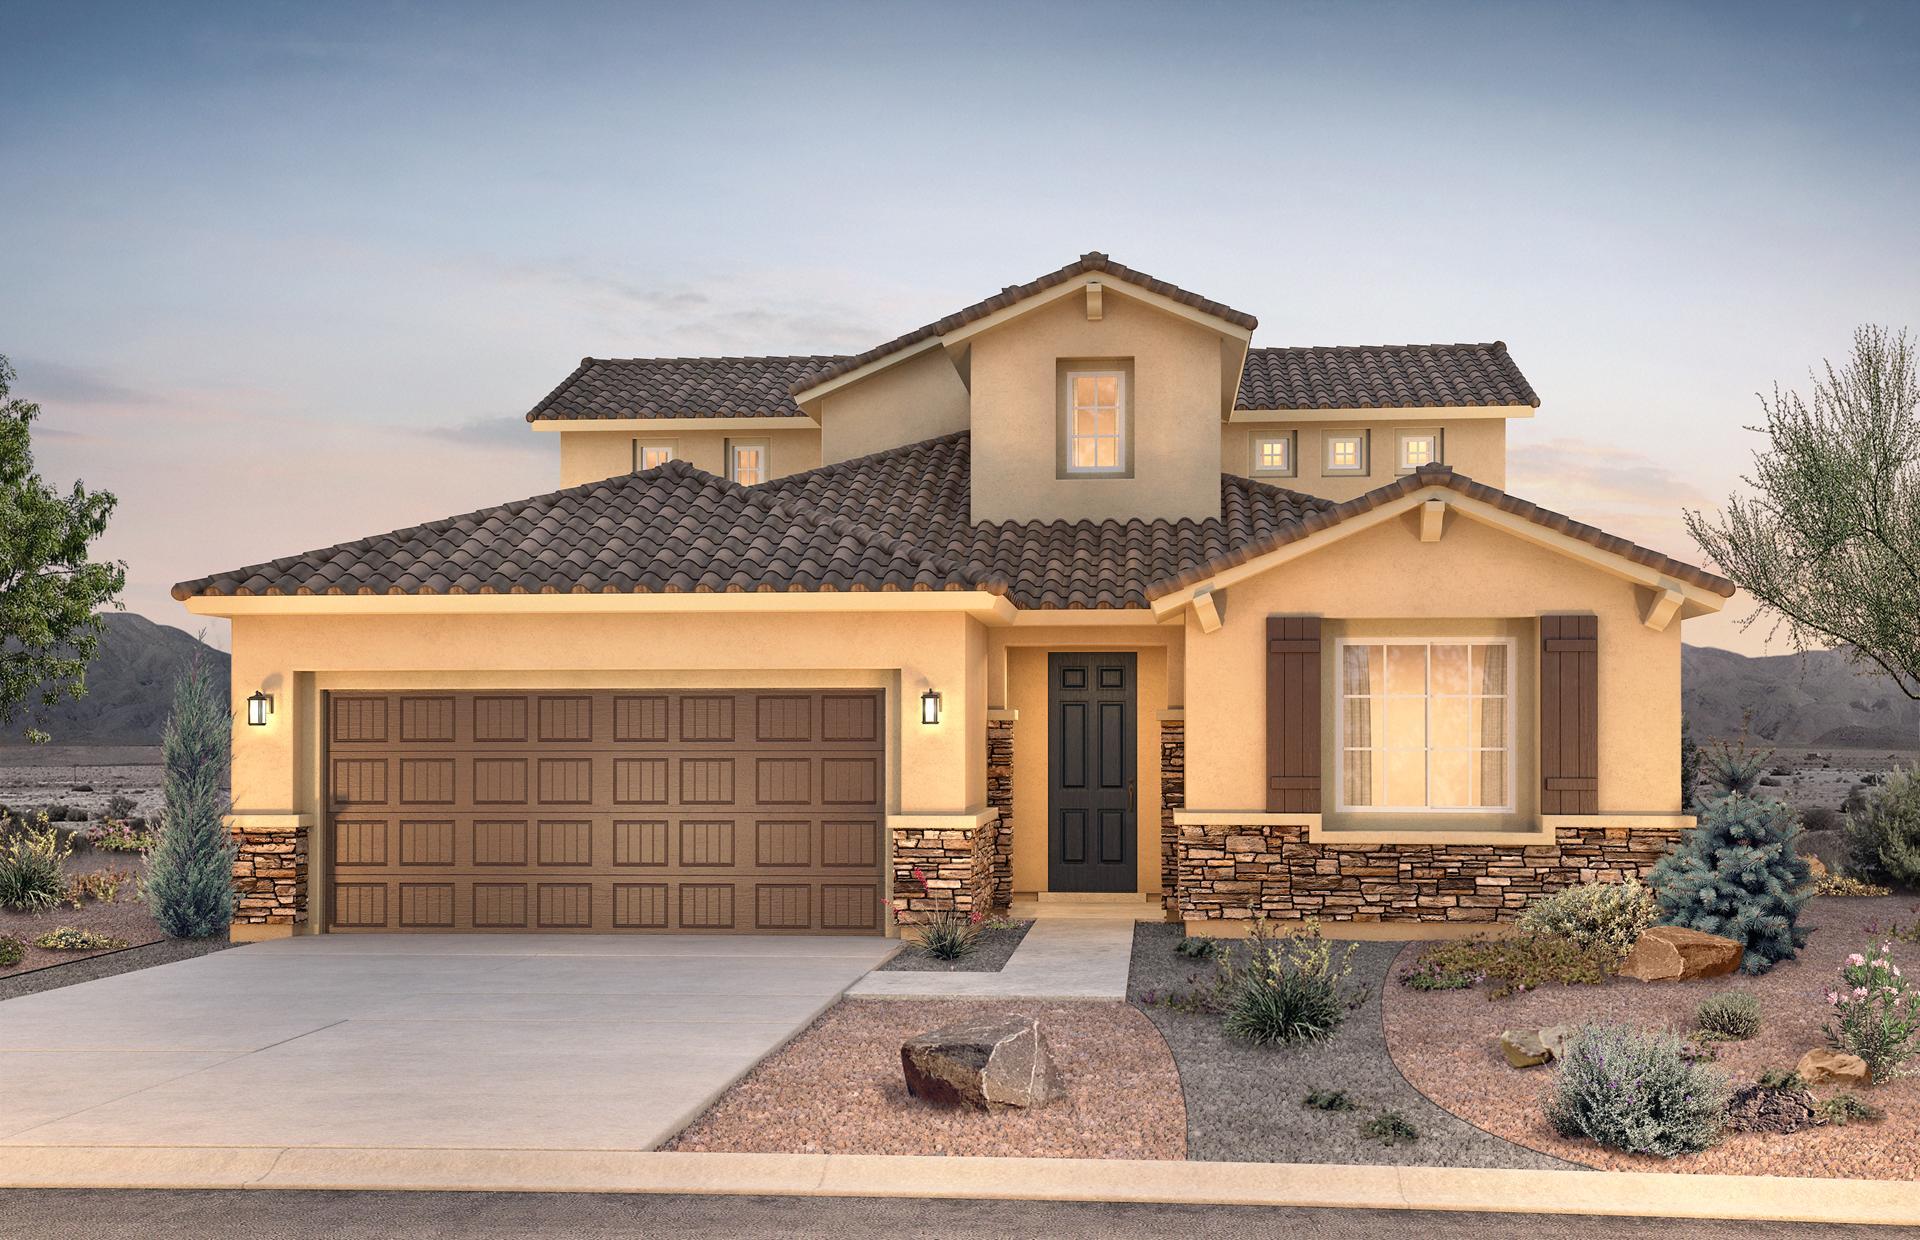 8704 La Pradera Way NE Property Photo - Albuquerque, NM real estate listing